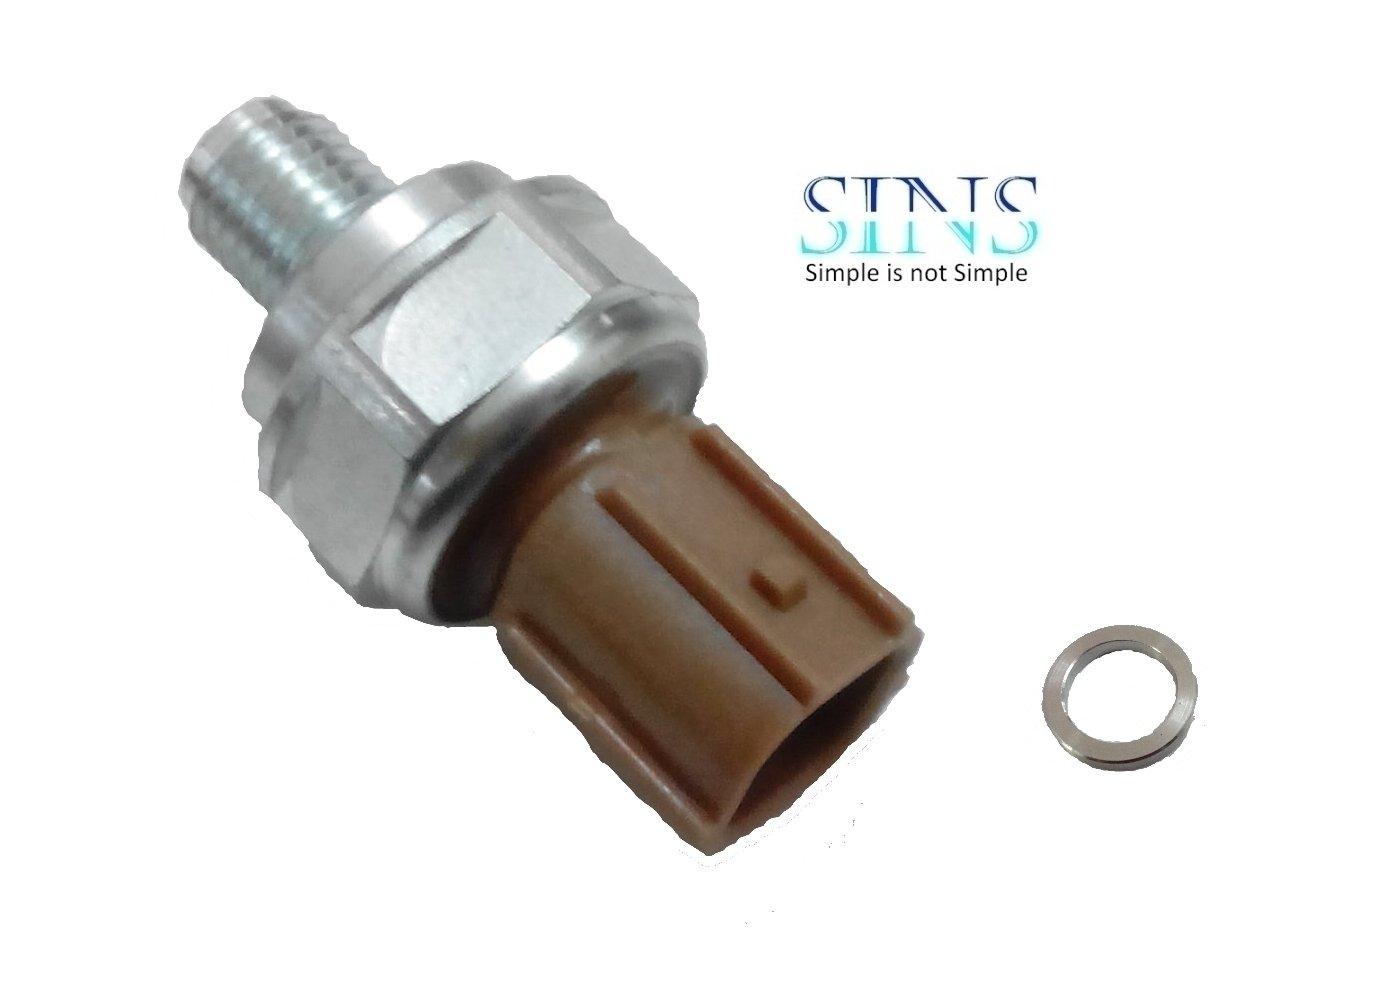 SINS - Odyssey Pilot CL TL MDX Transmission Pressure Switch 28600-P7W-003 28600-P7W-013